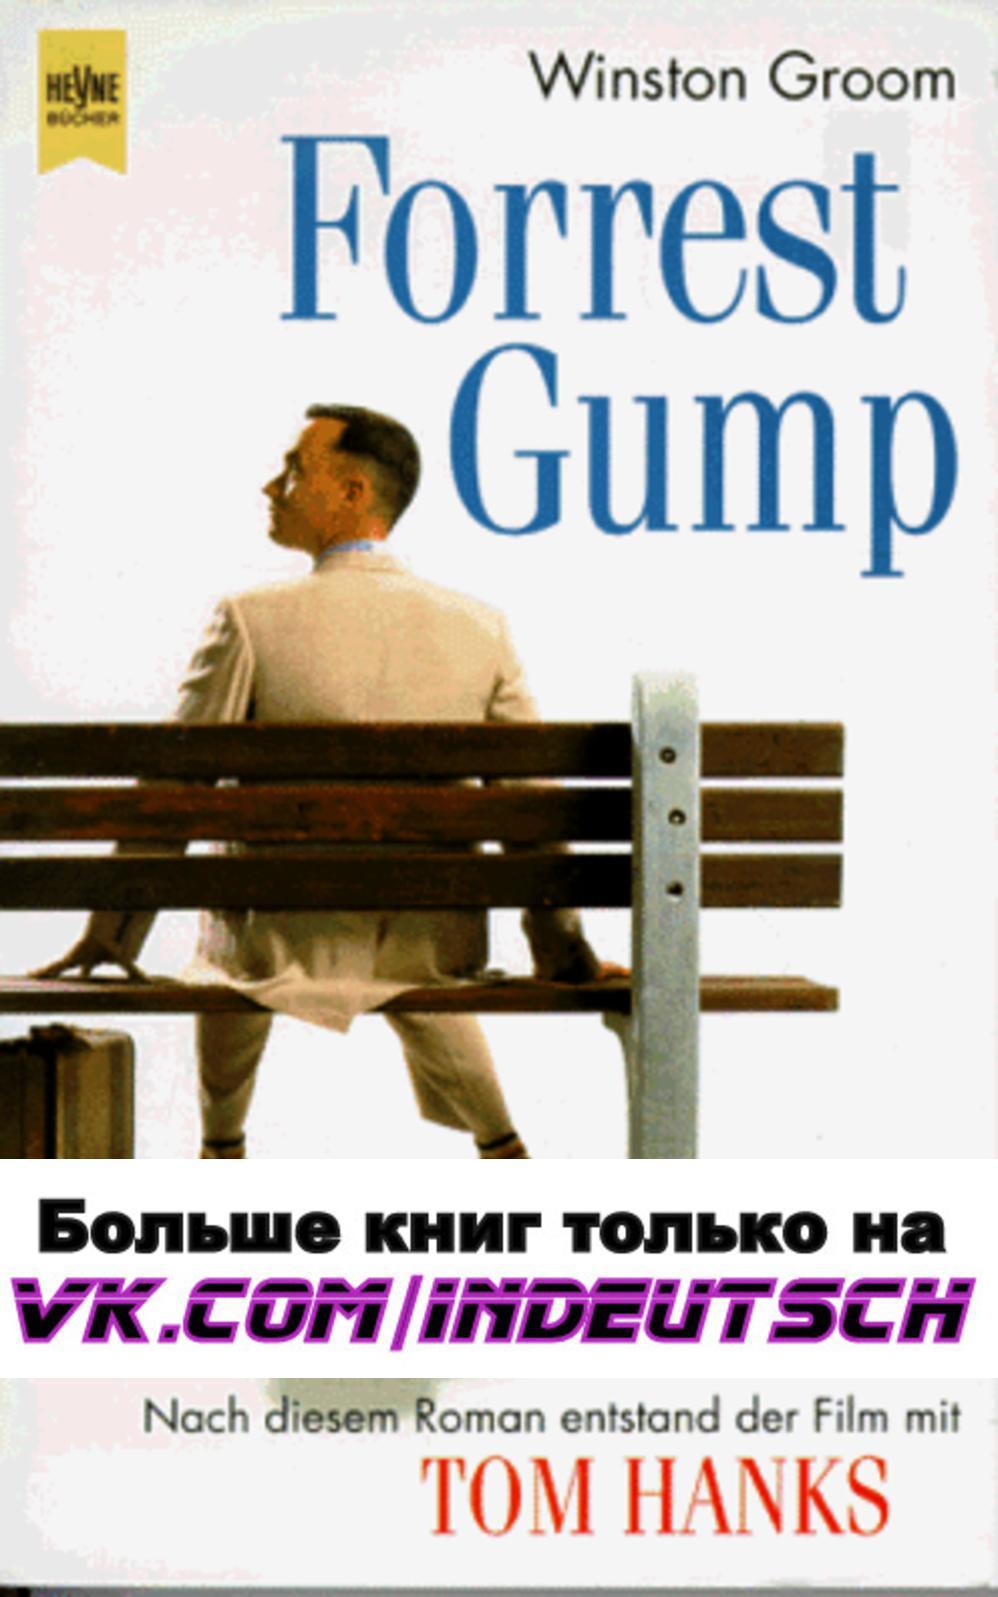 Calam O Forrest Gump George Winston Farben Tanzen Noten pour Calam?O